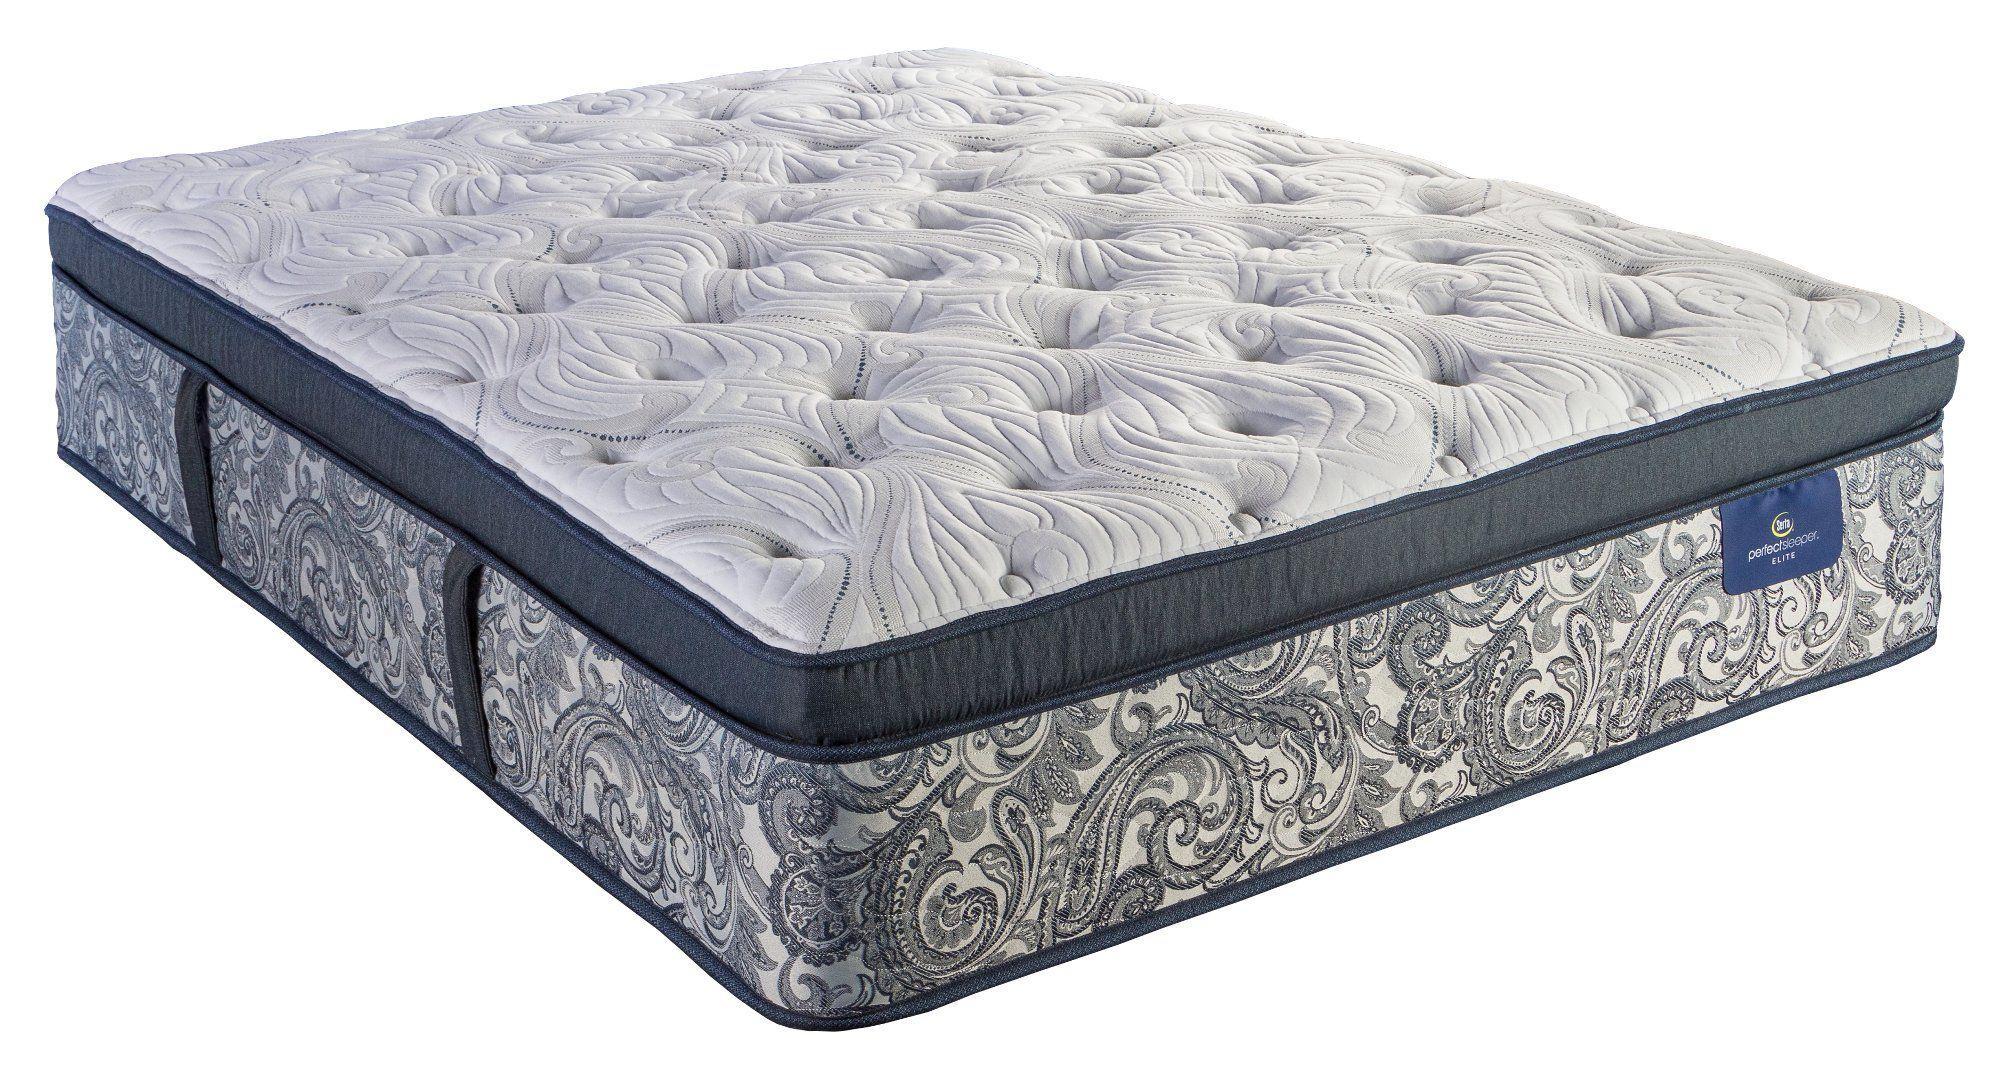 Serta Perfect Sleeper Super Pillow Top Full Size Mattress